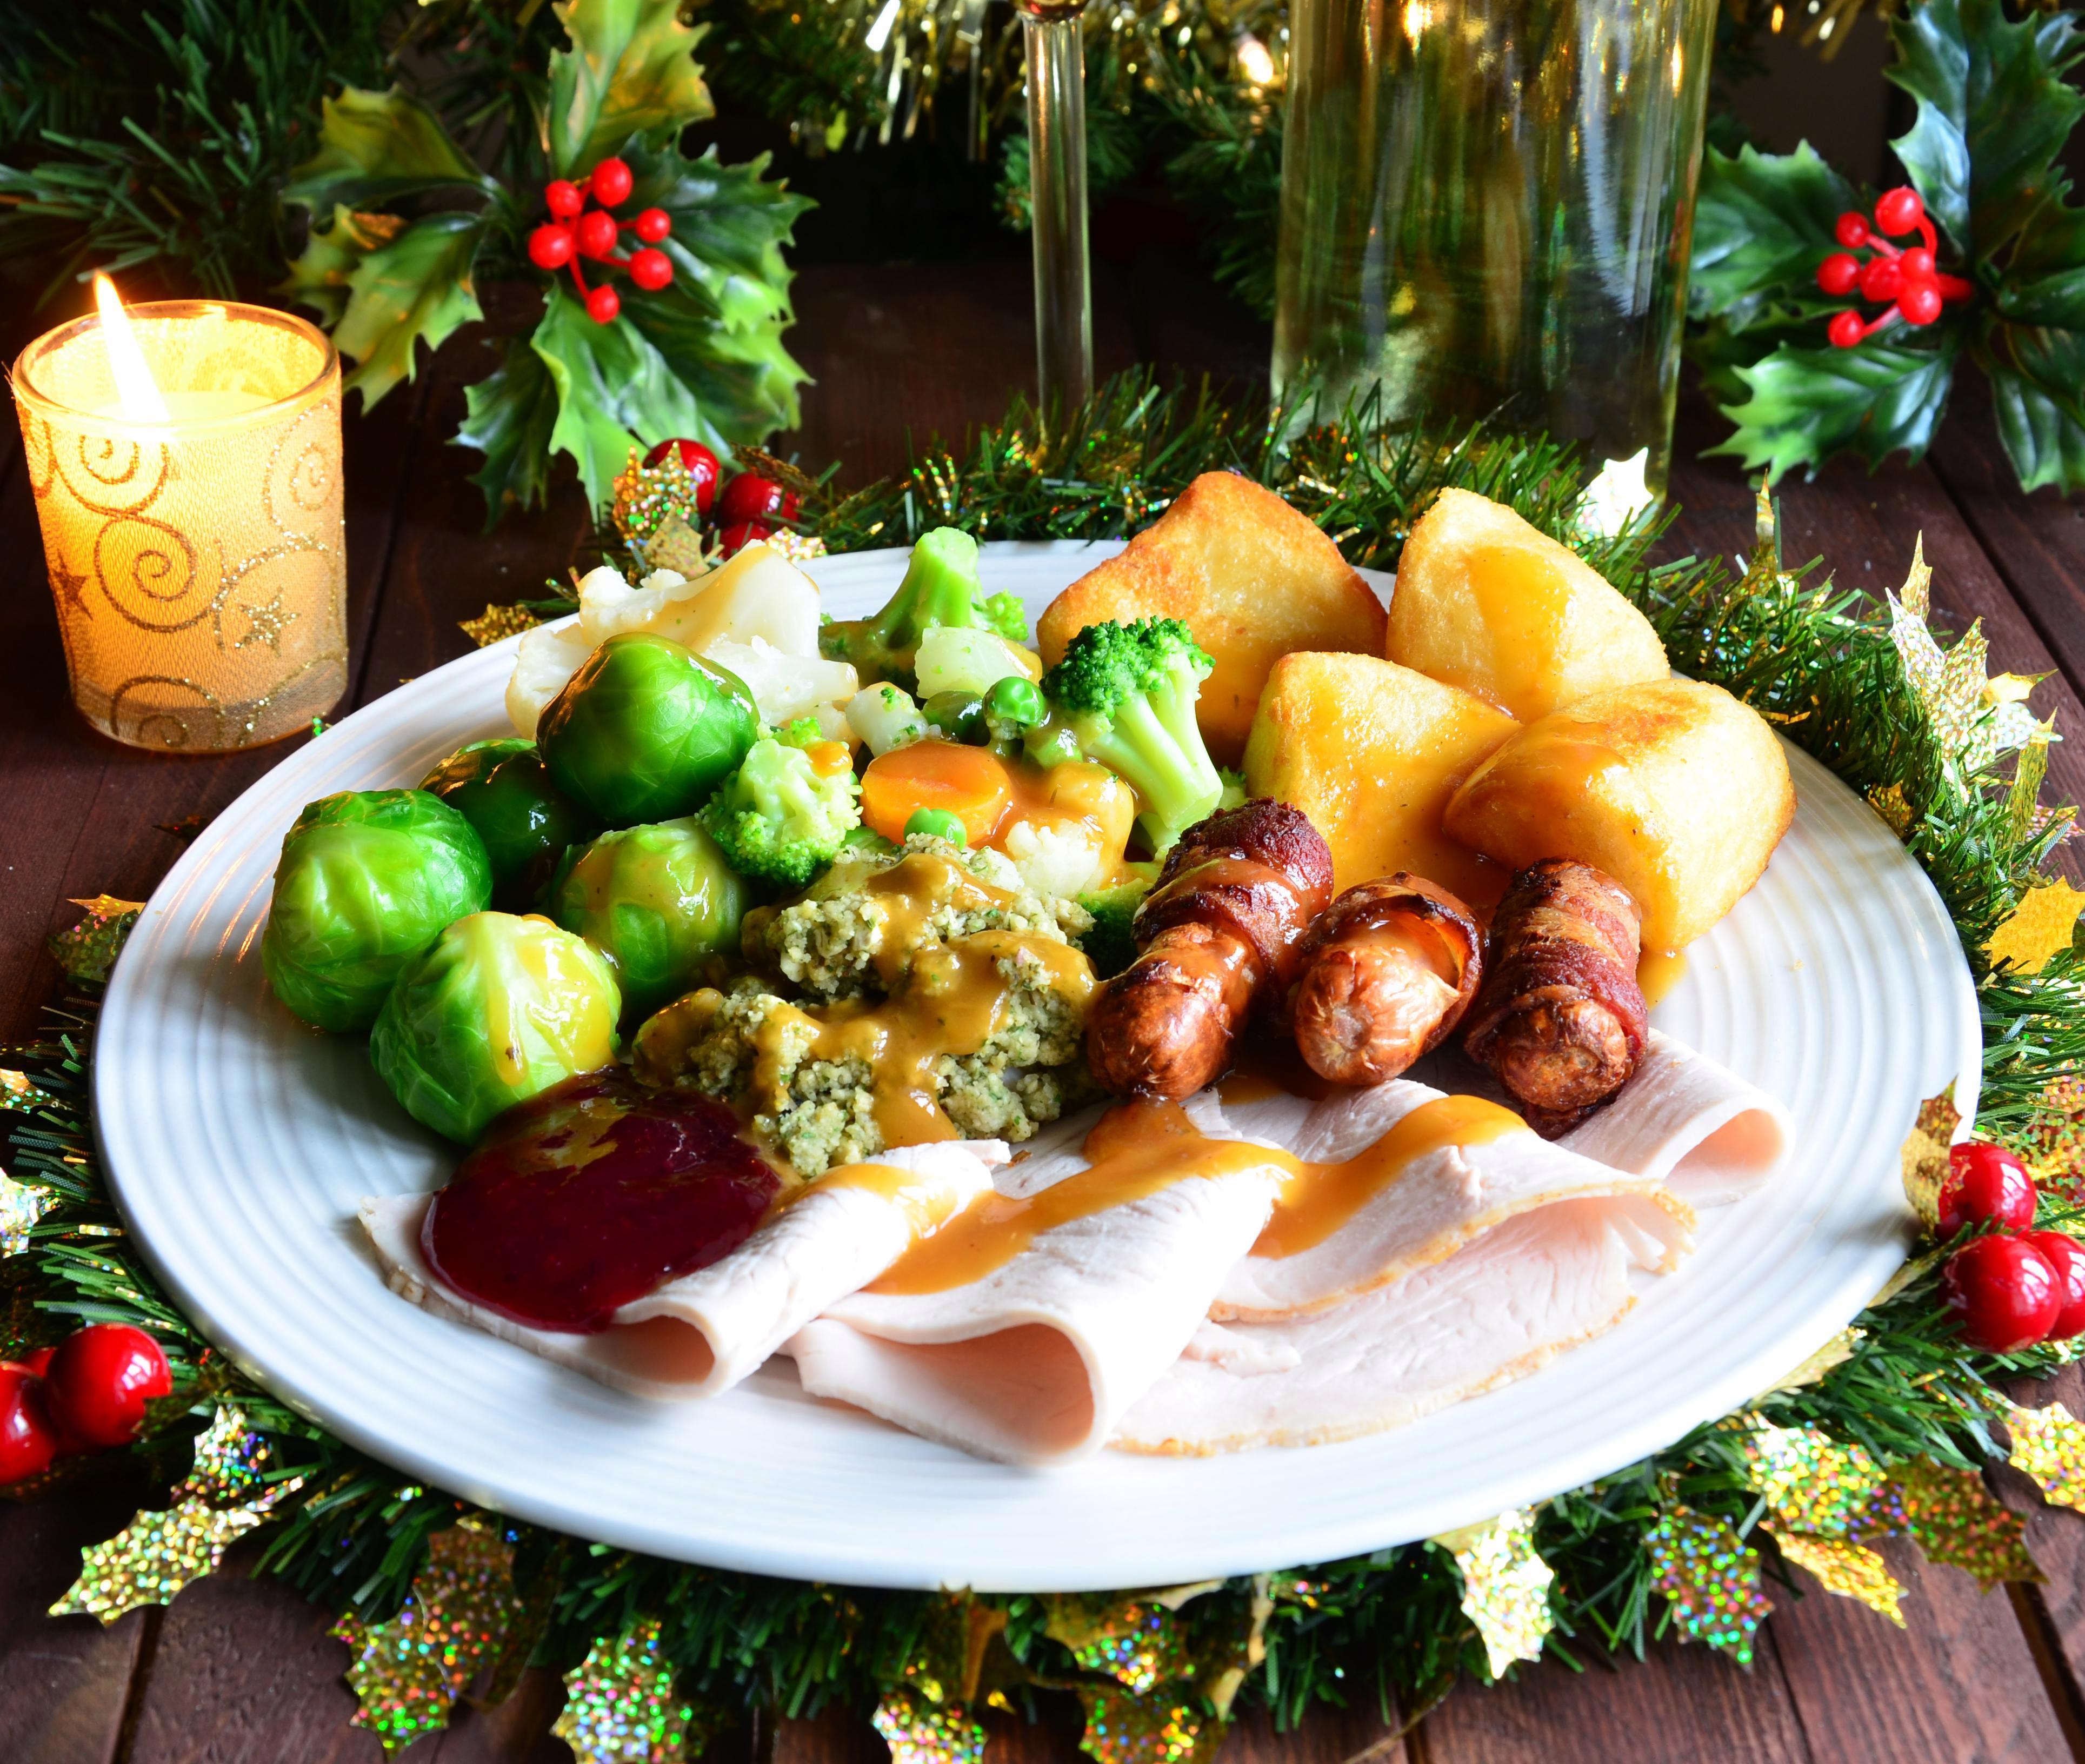 Aldi cuts Christmas dinner veggies to just 28p per pack in festive feast price war